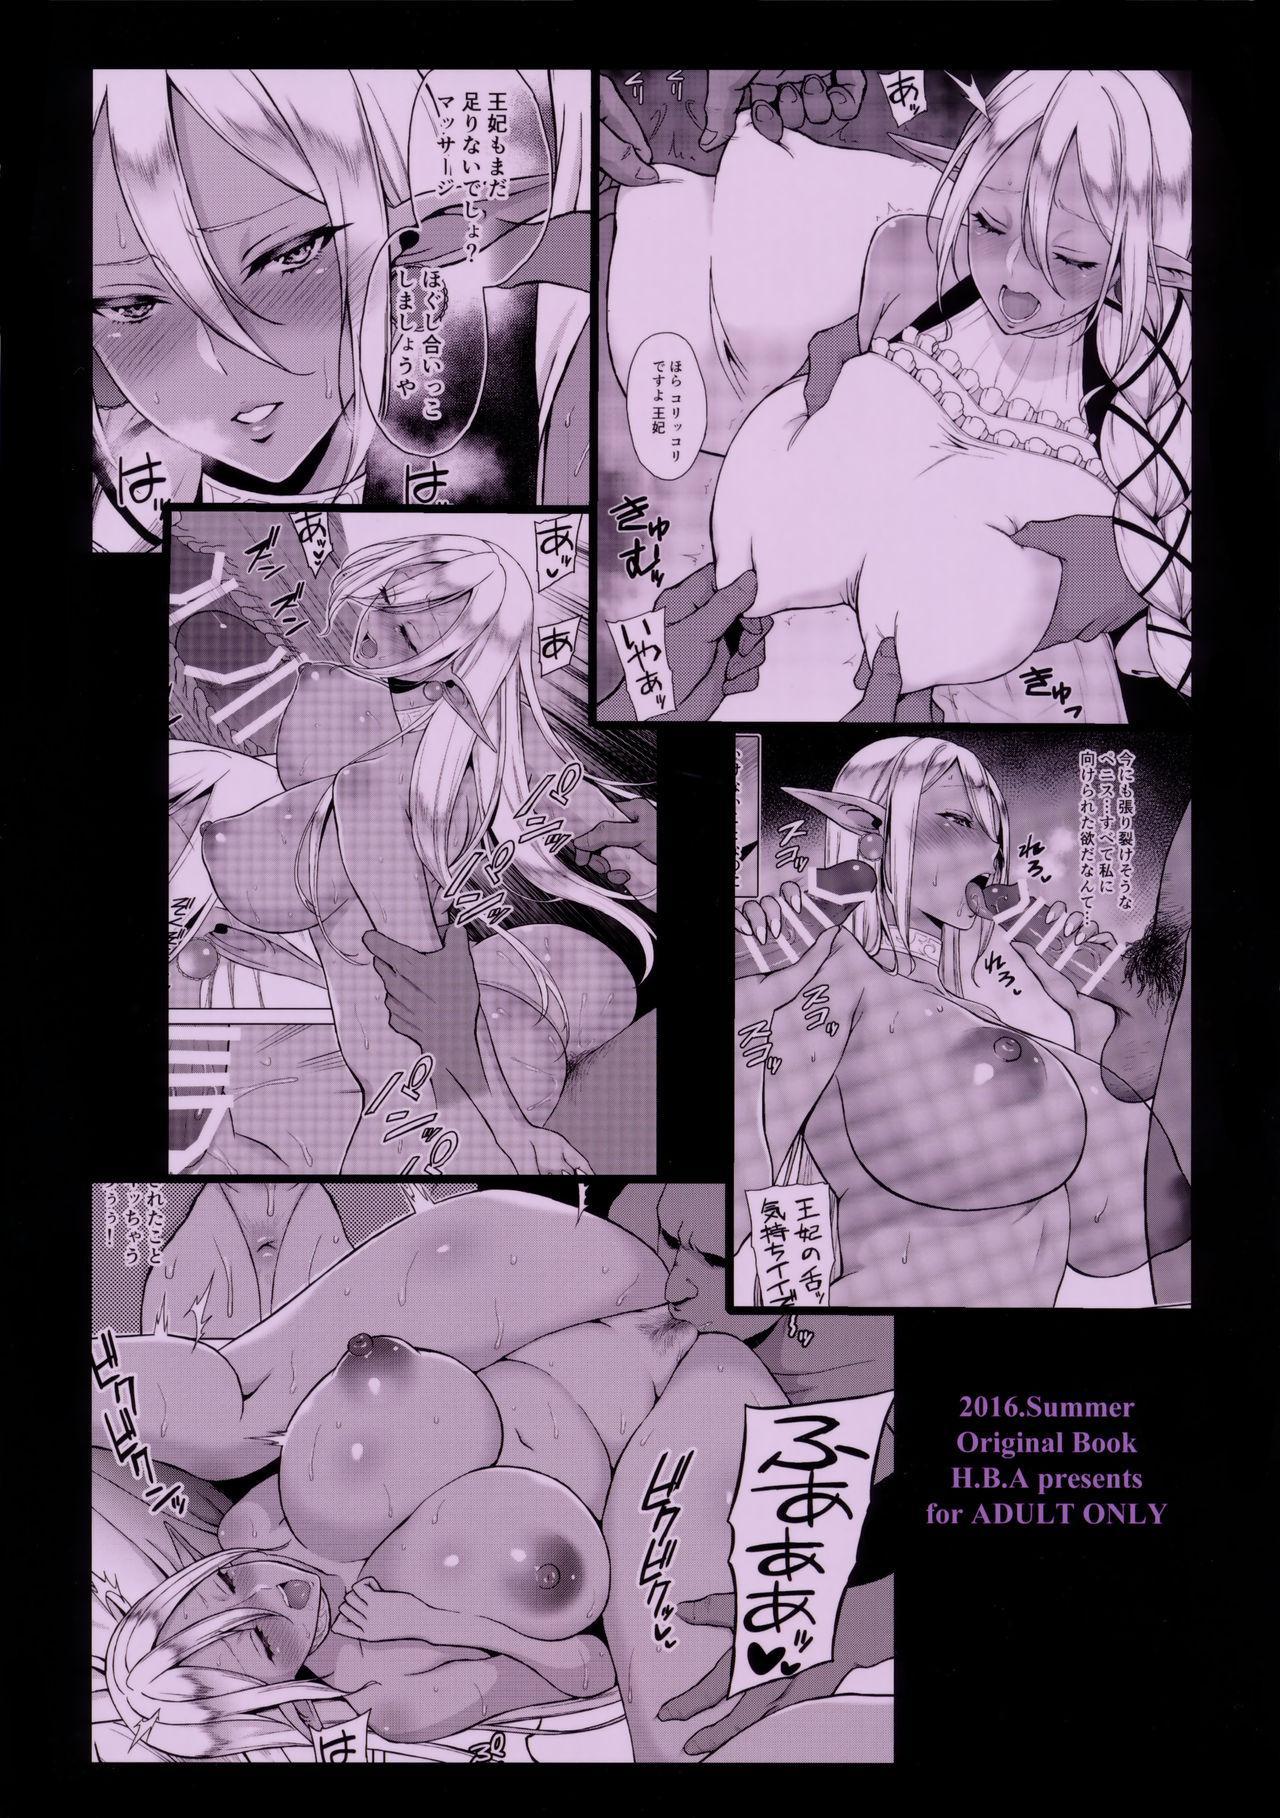 (C90) [H.B.A (Usagi Nagomu)] Inka -Nikuyoku ni Aragaenai Karada- + C90 Kaijou Genteibon   Flower of Lust -The Irresistible Desires of the Flesh- + C90 Assembly Hall Exclusive [English] [darknight] 25